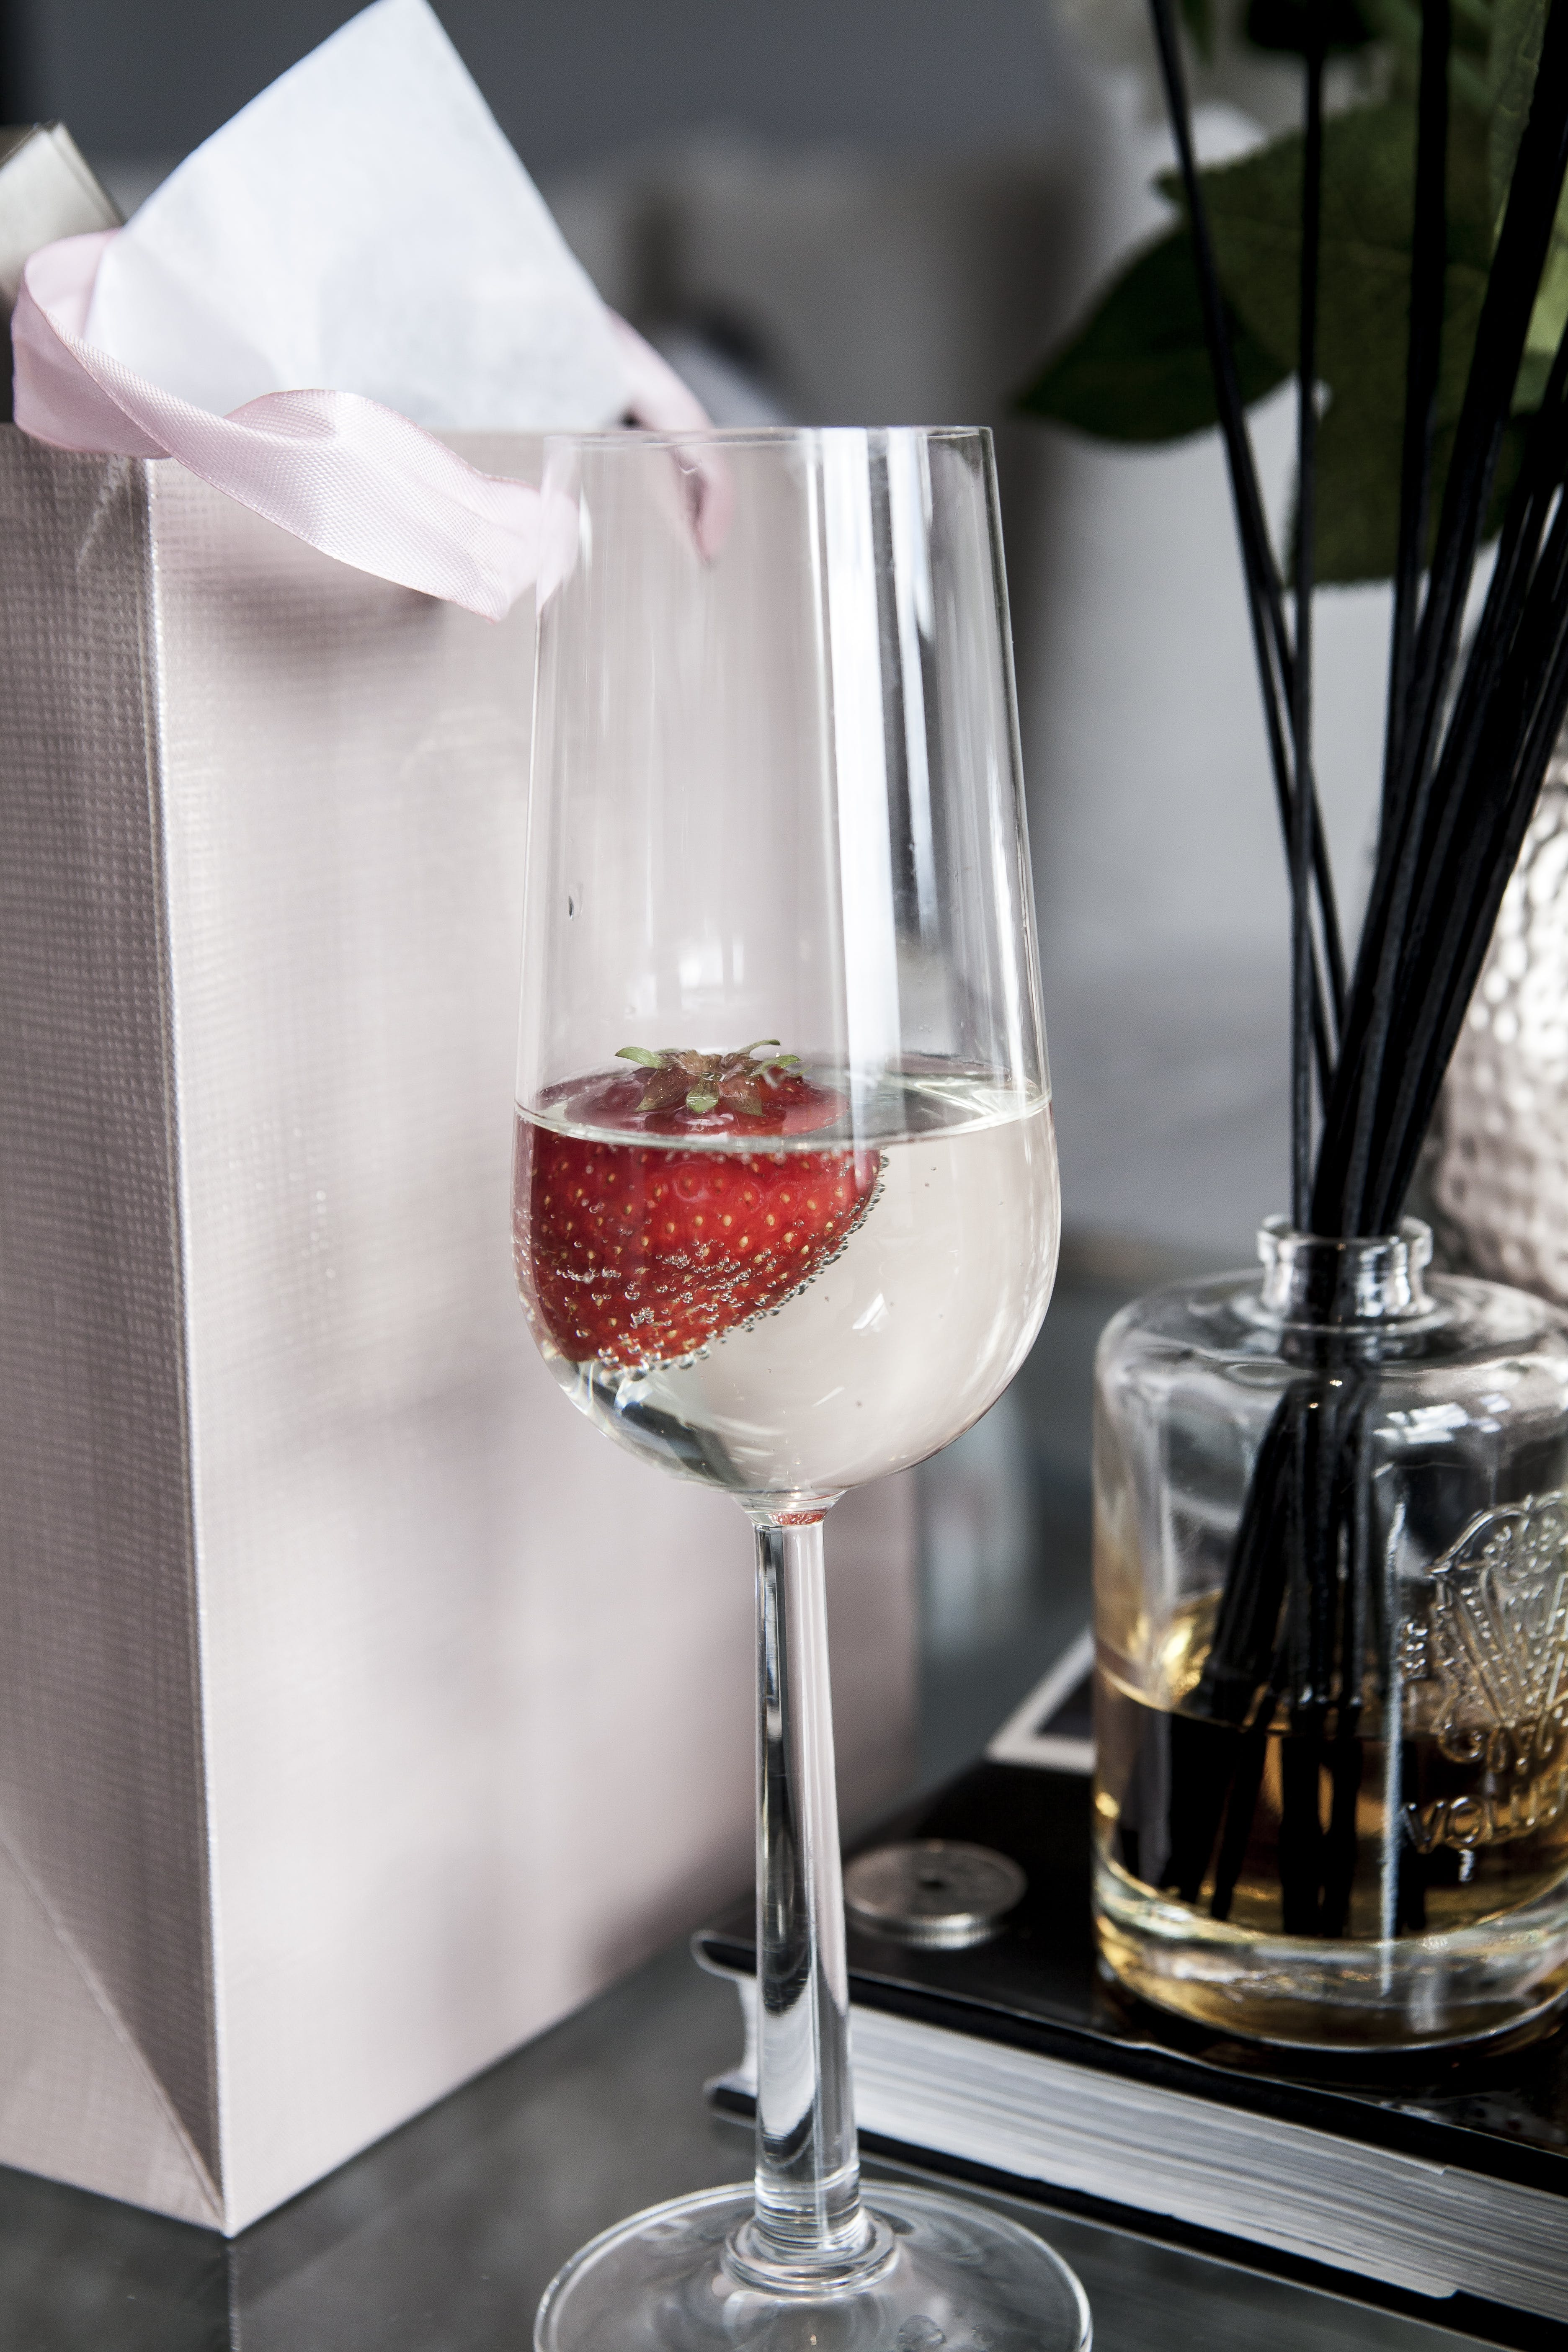 zu alkohol, bar, buch, champagner